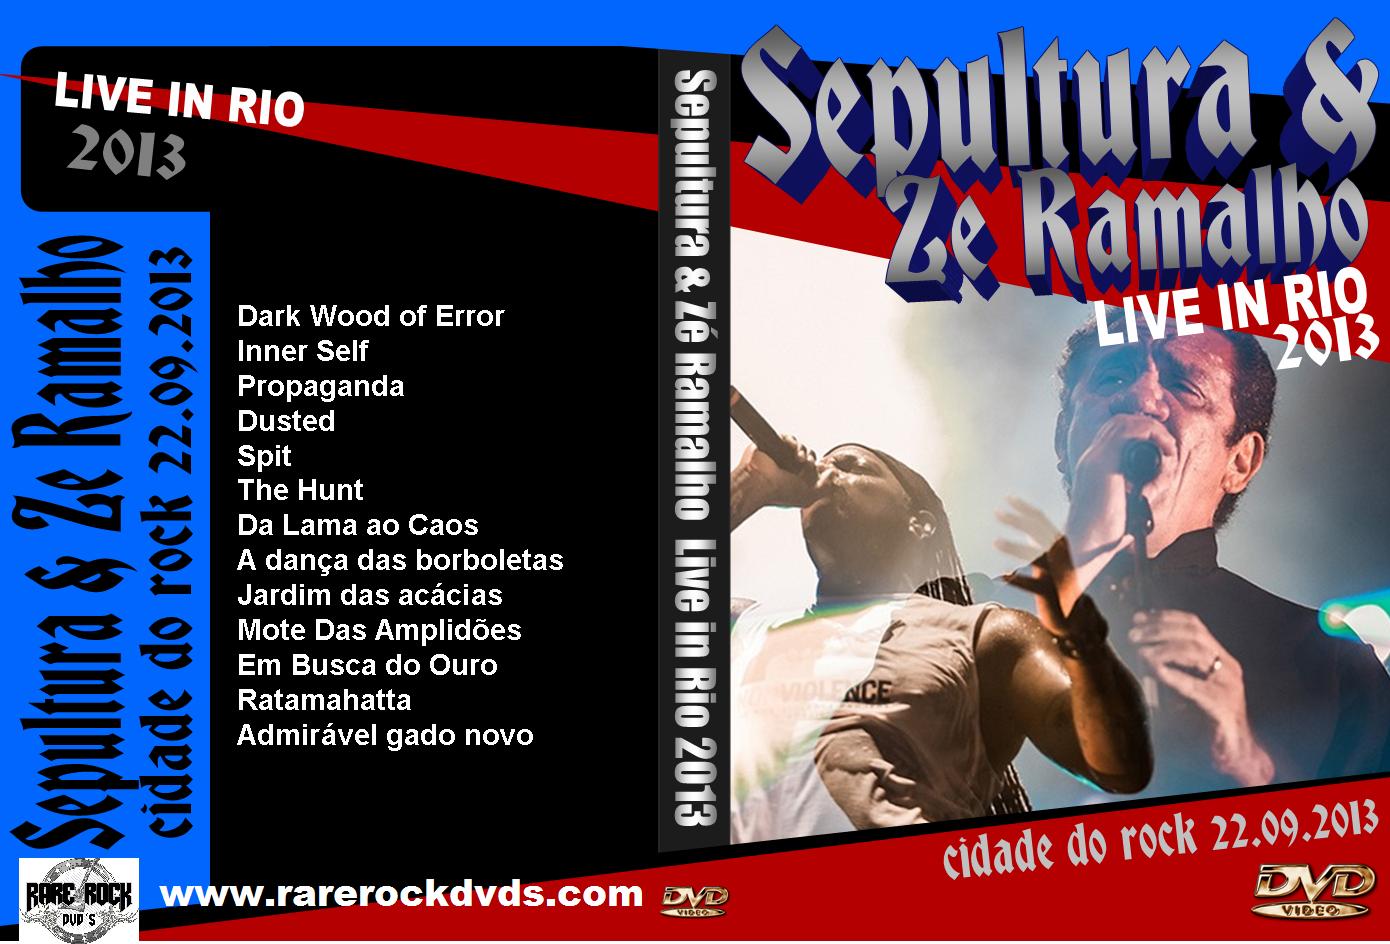 Sepultura E Zé Ramalho – Live Rock in Rio 2013 DVD